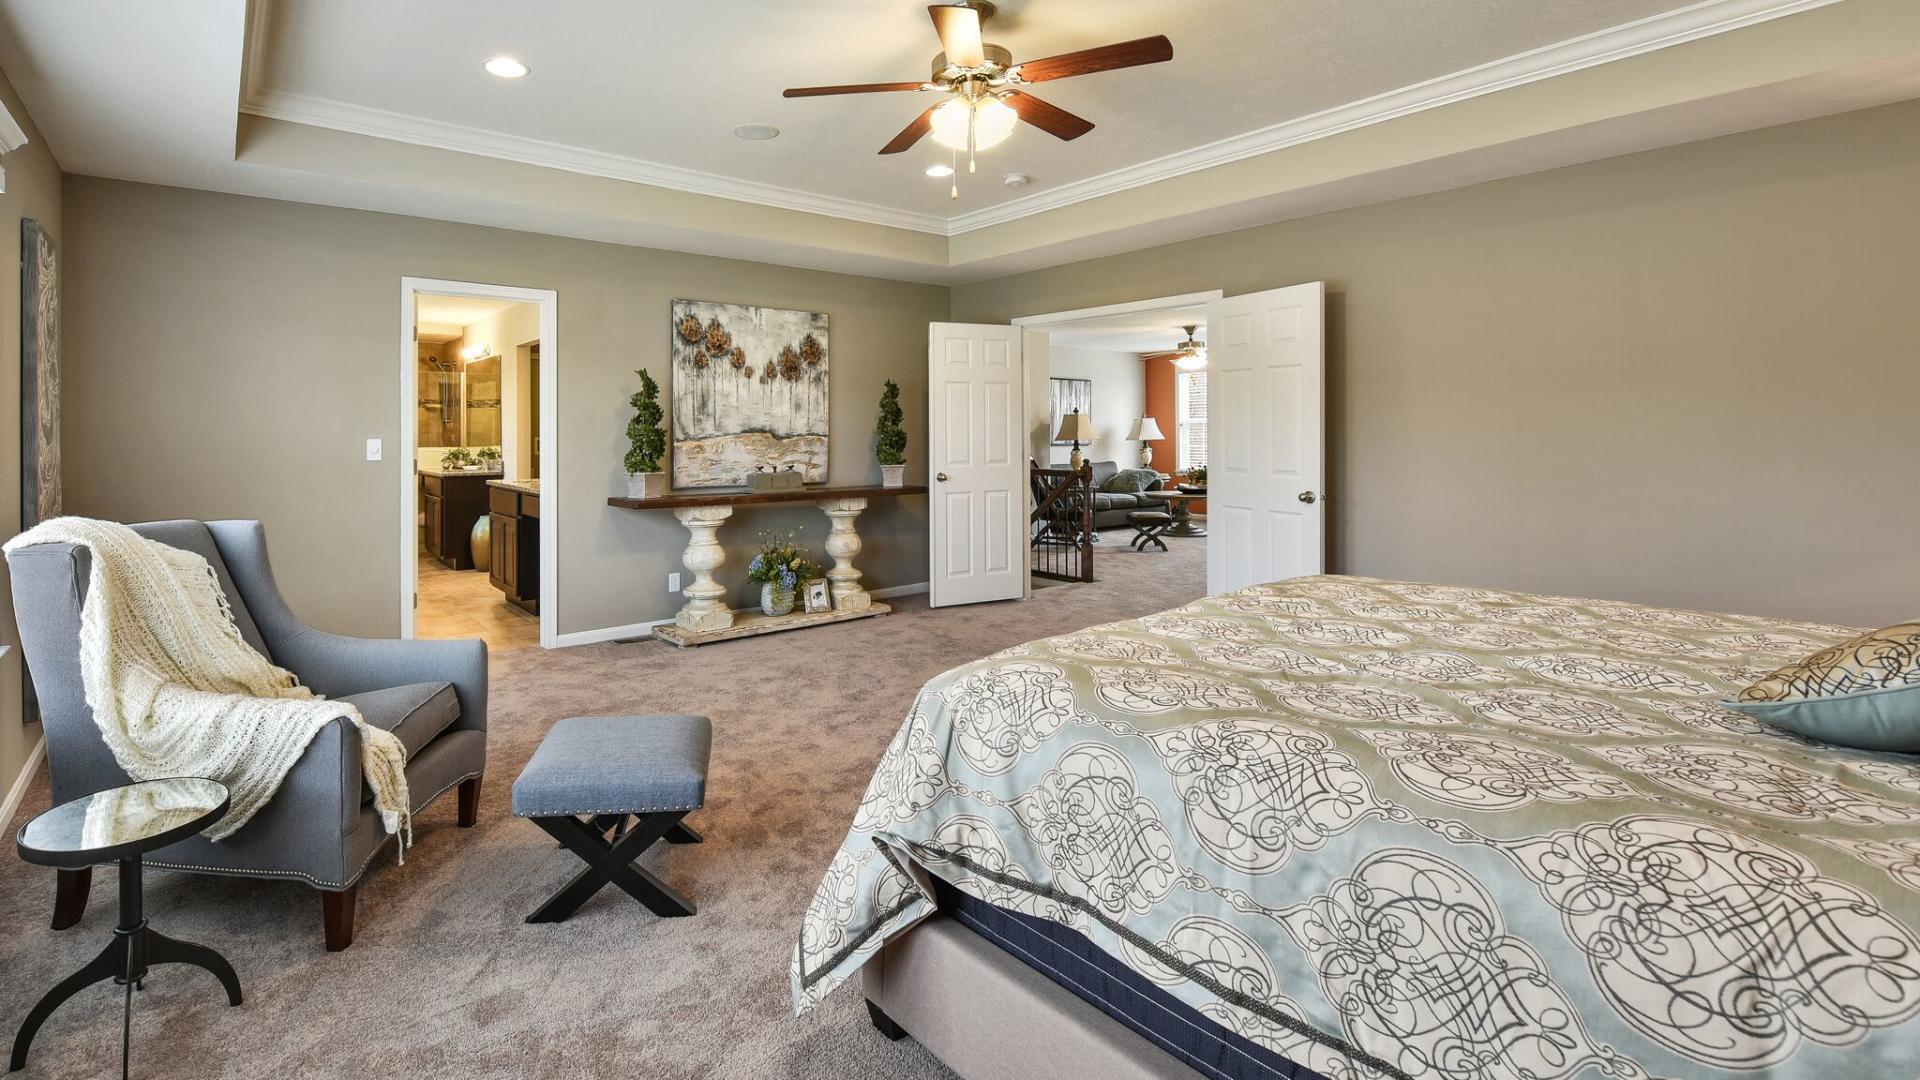 Bedroom featured in the Birmingham By Maronda Homes in Cincinnati, KY